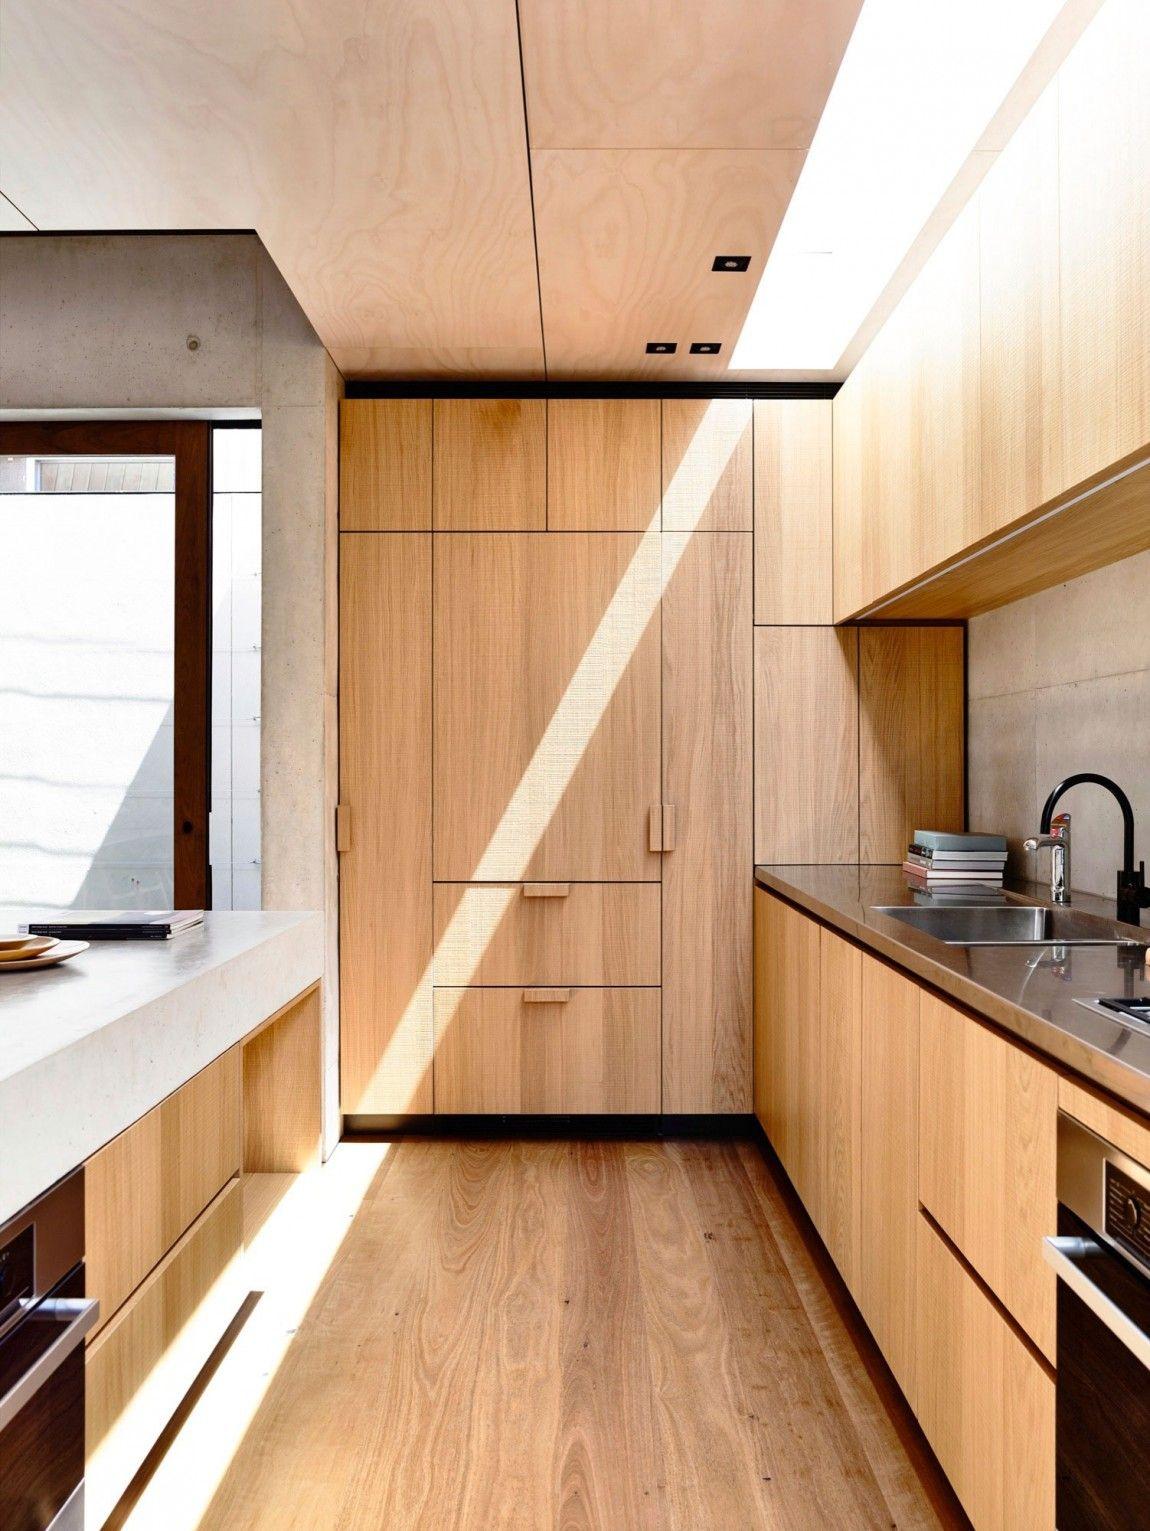 2016 Beach Avenue By Schulberg Demkiw Architects (7